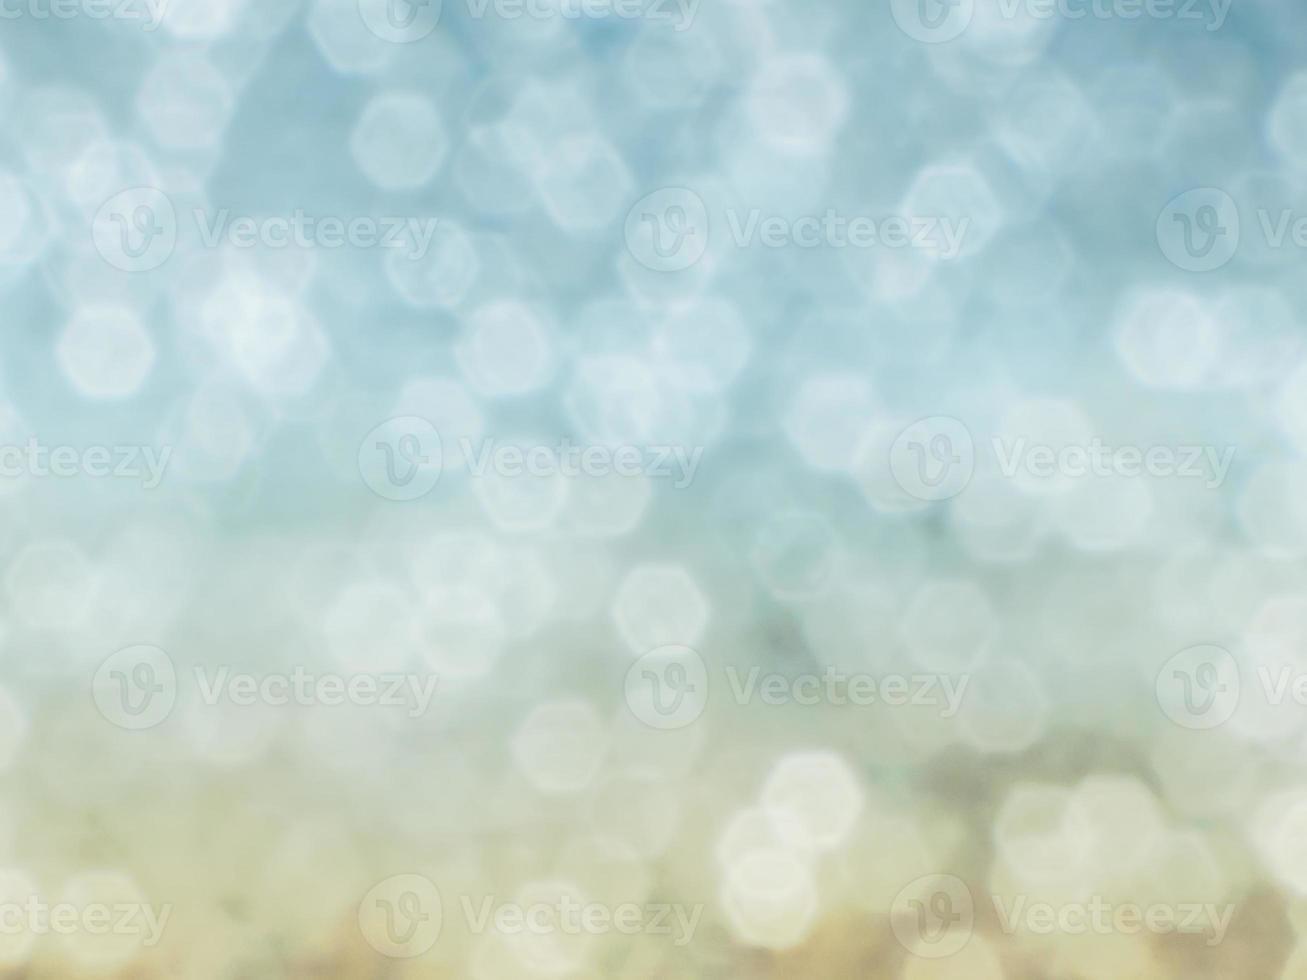 sommar oskärpa bakgrund foto